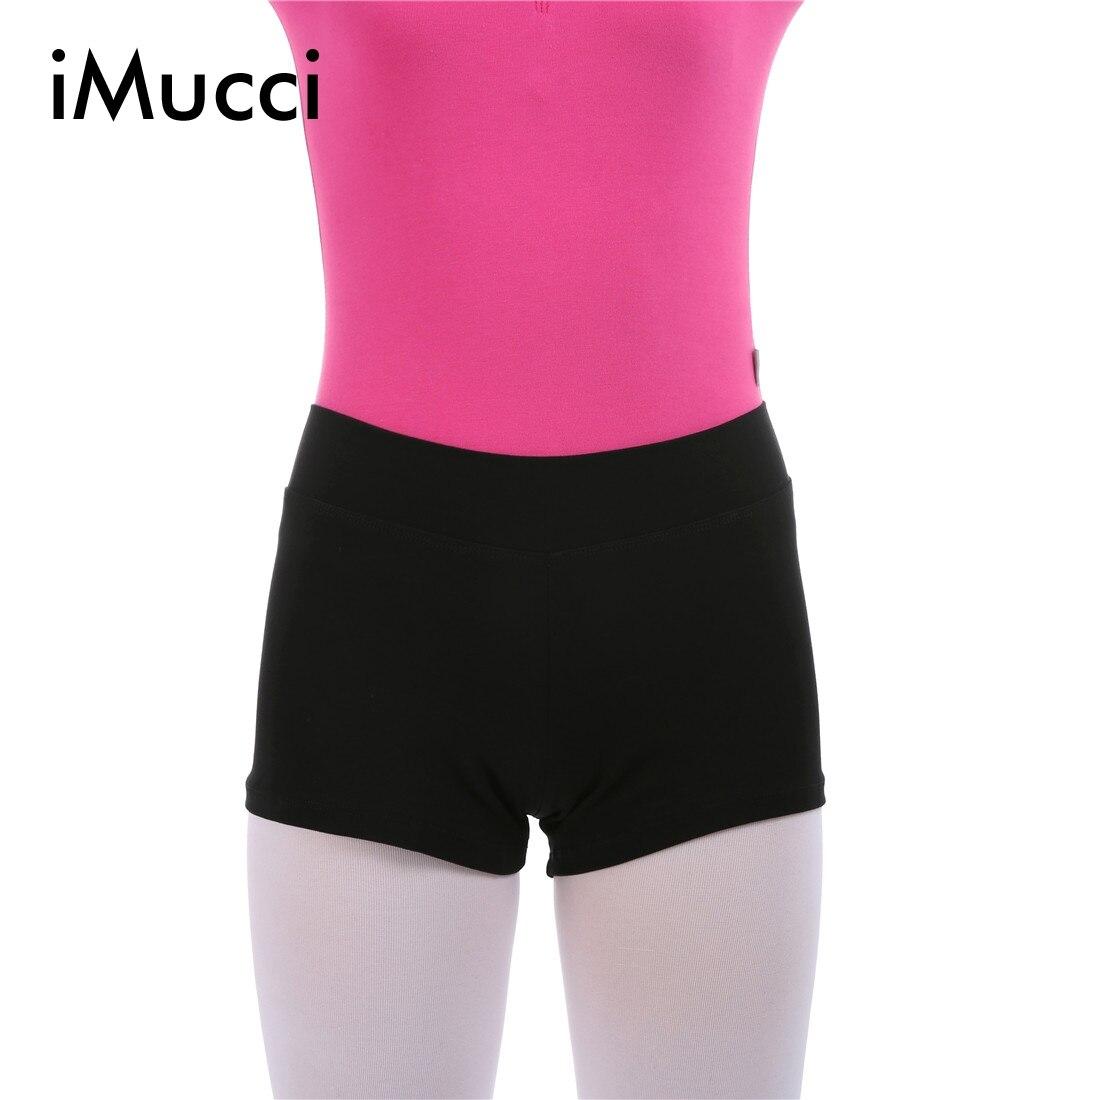 IMucci High Waist Elastic Cotton Ballet Shorts Black Ballerina Gymnastic Leotards Short Training ...